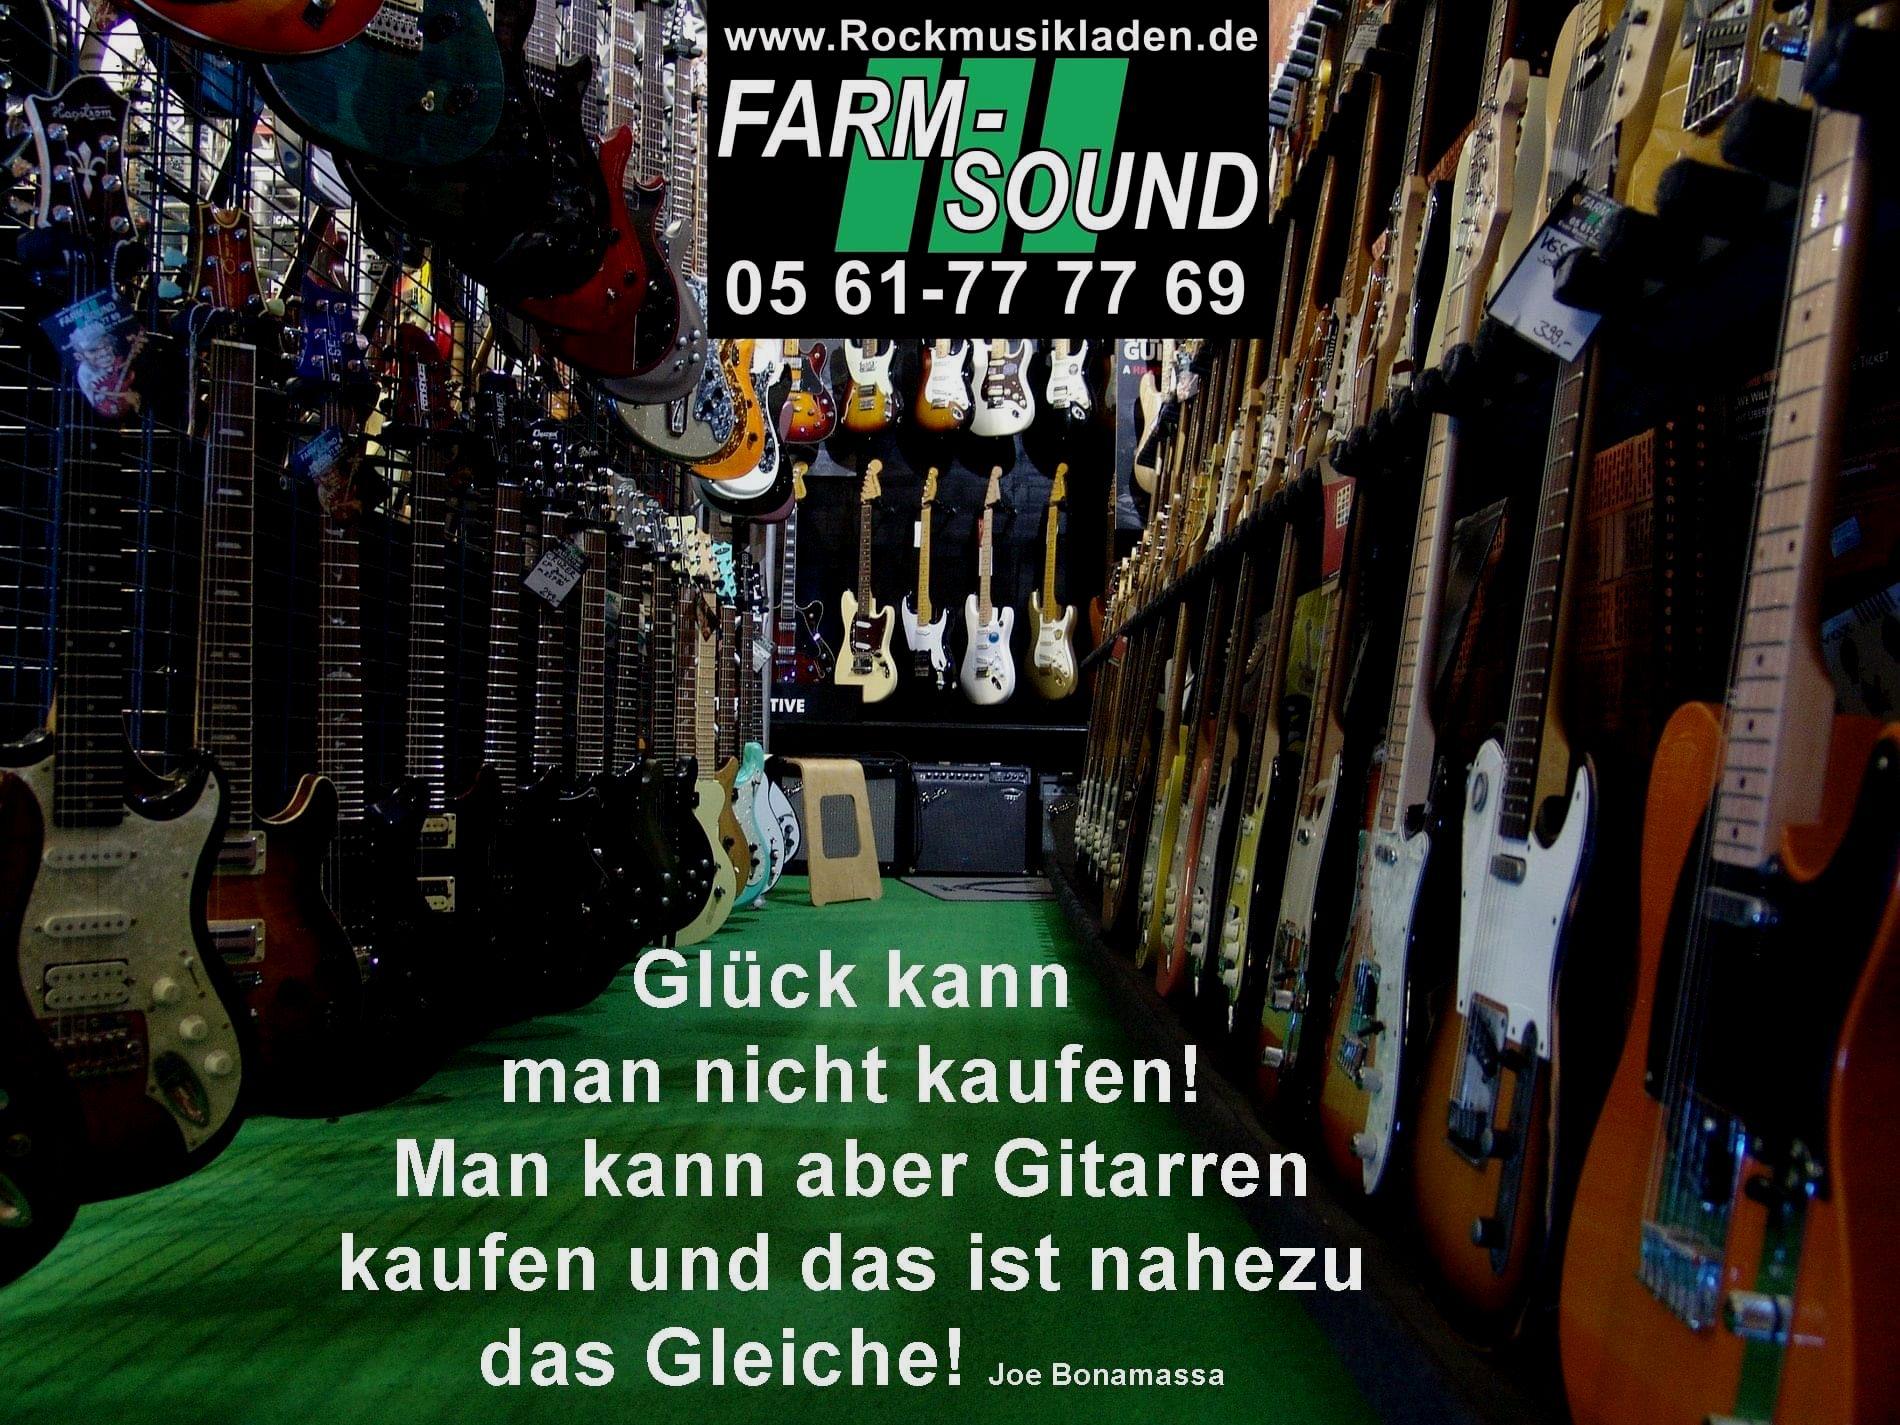 FARM-SOUND Musicshop